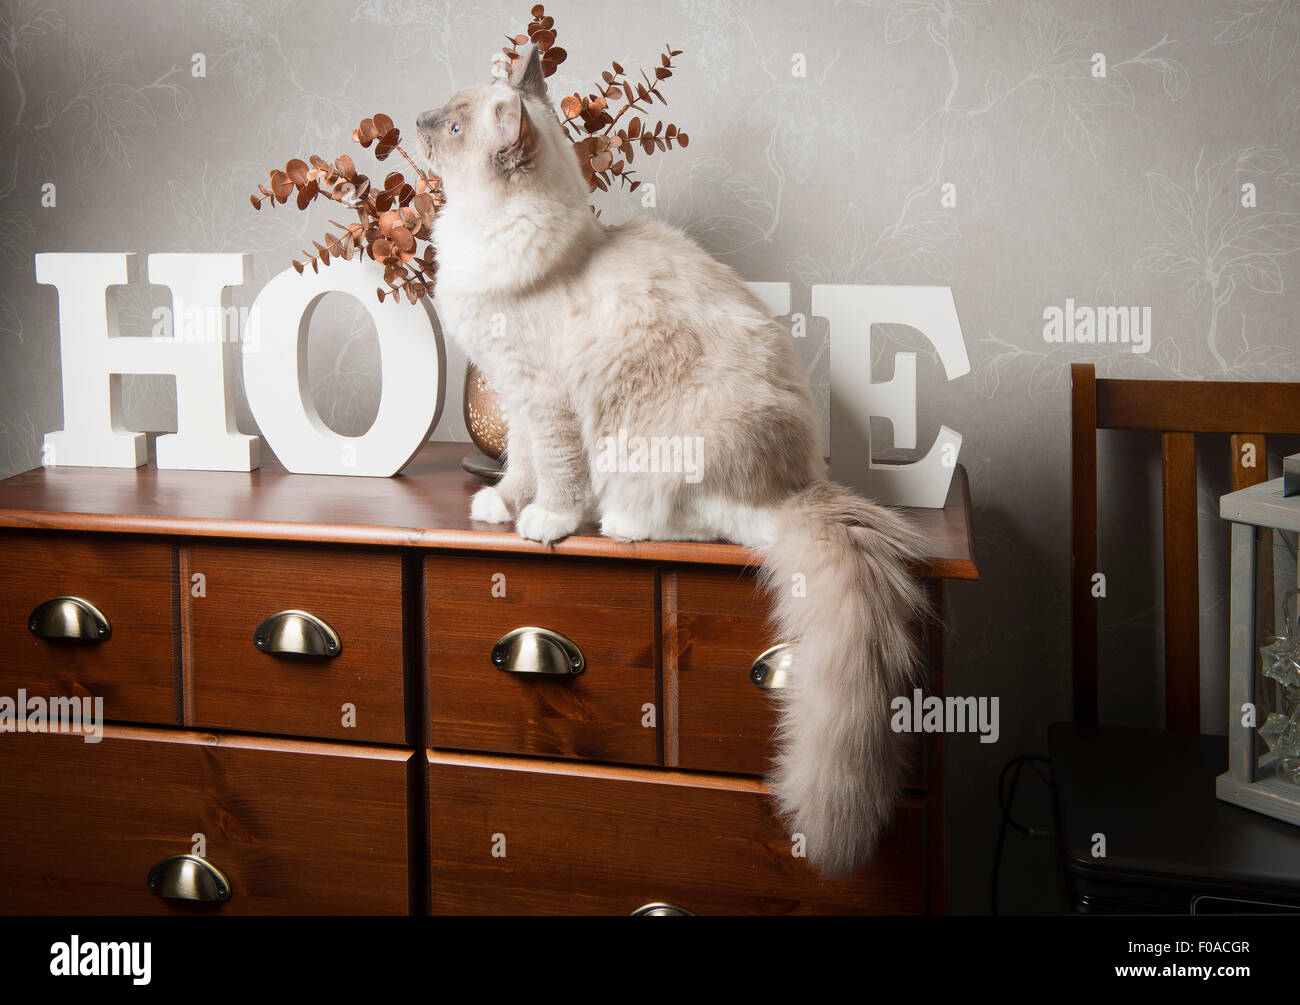 Ragdoll cat sitting on sideboard - Stock Image